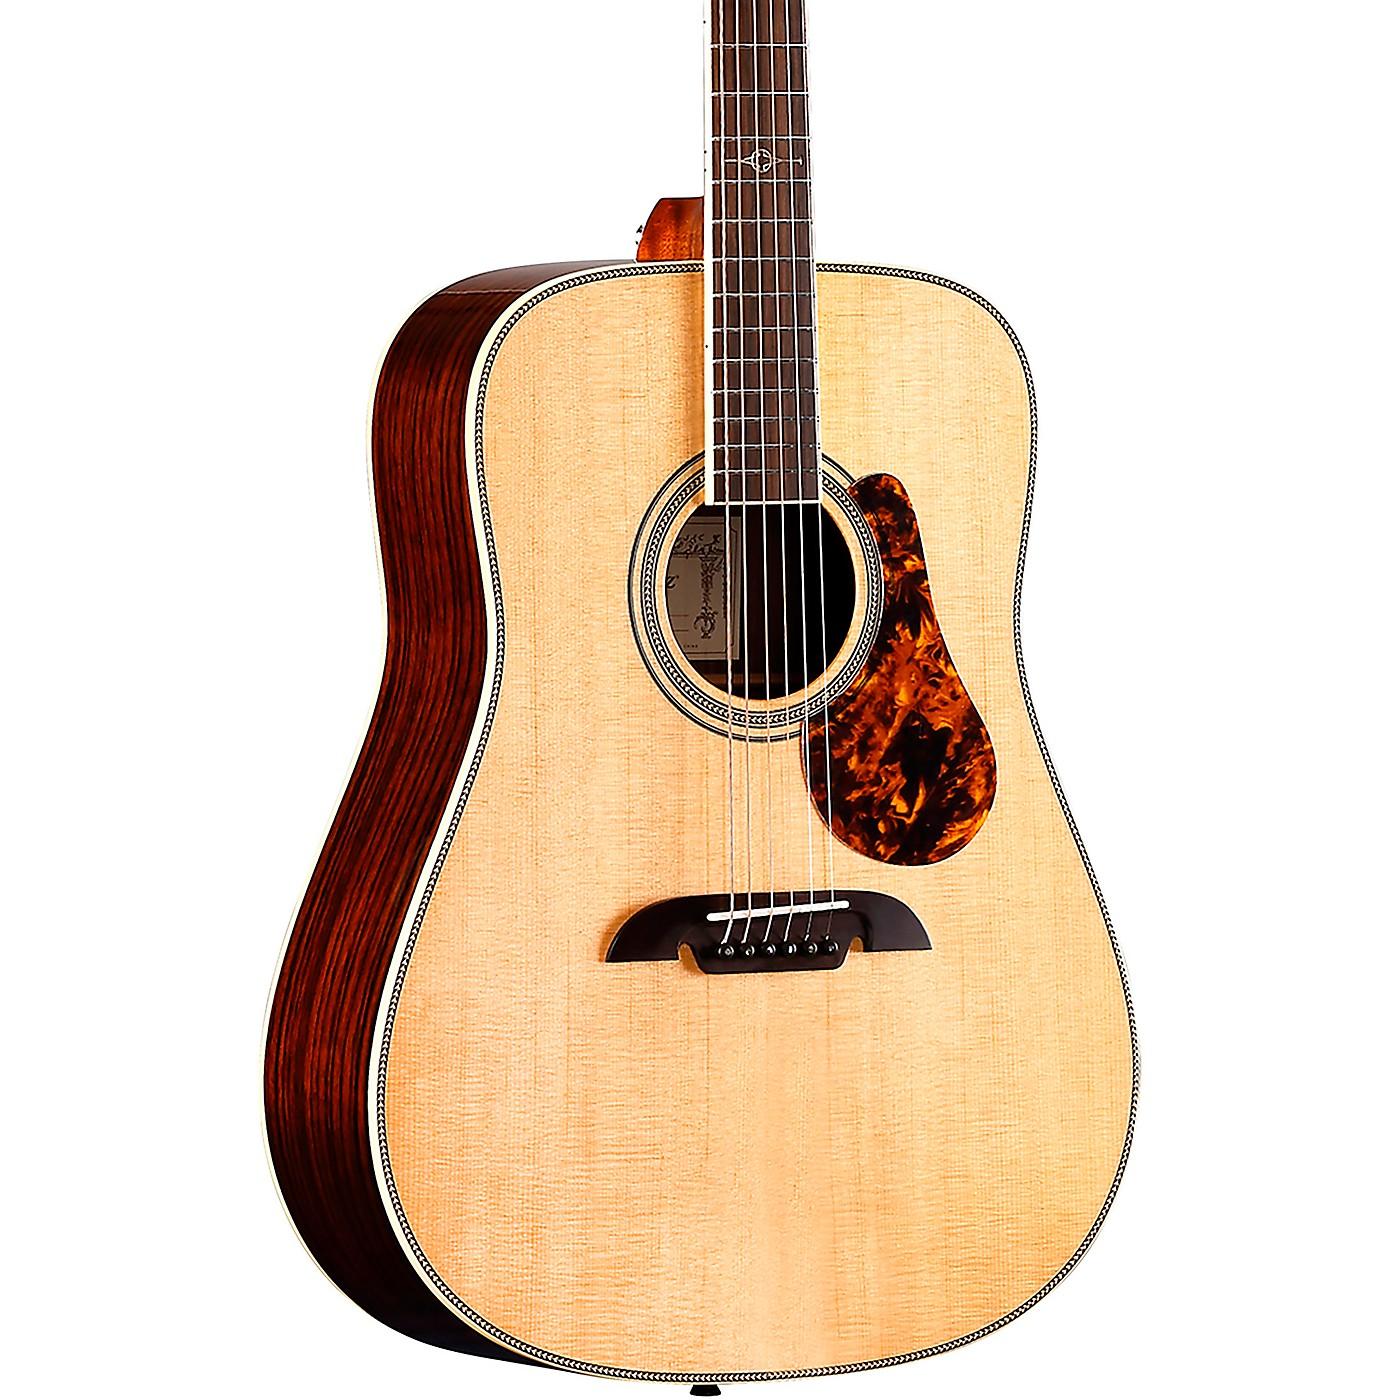 Alvarez MD70BG Masterworks Dreadnought Acoustic Guitar thumbnail